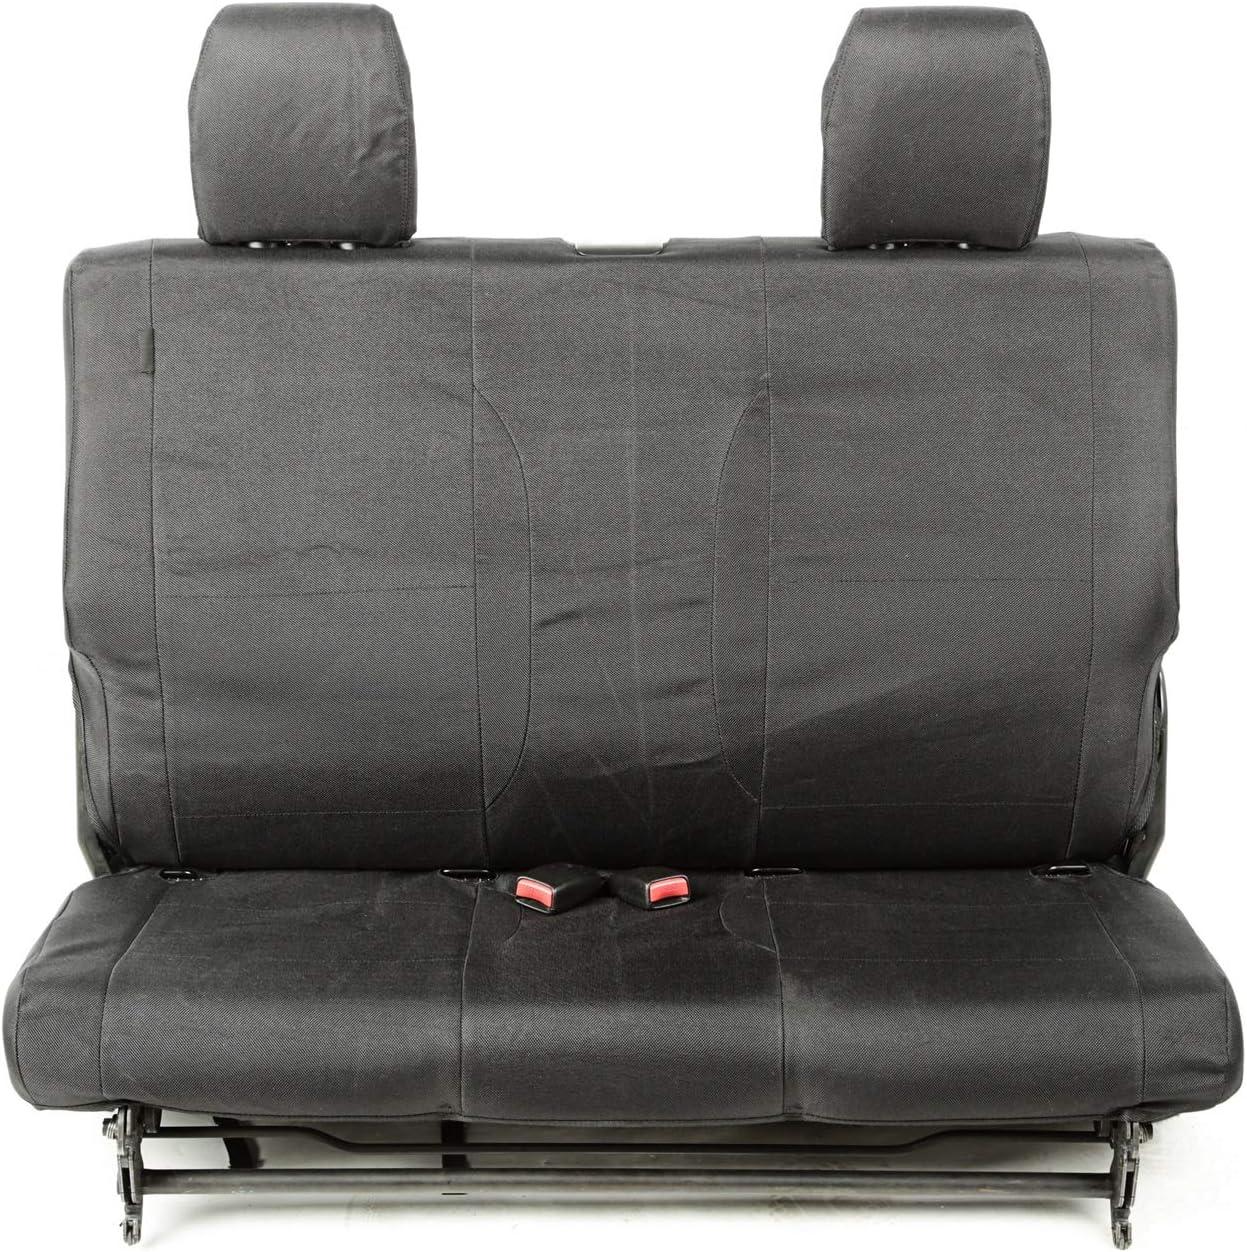 Rugged Ridge 13266.01 E-Ballistic Seat Cover Rear Black 07-10 JK 2Dr